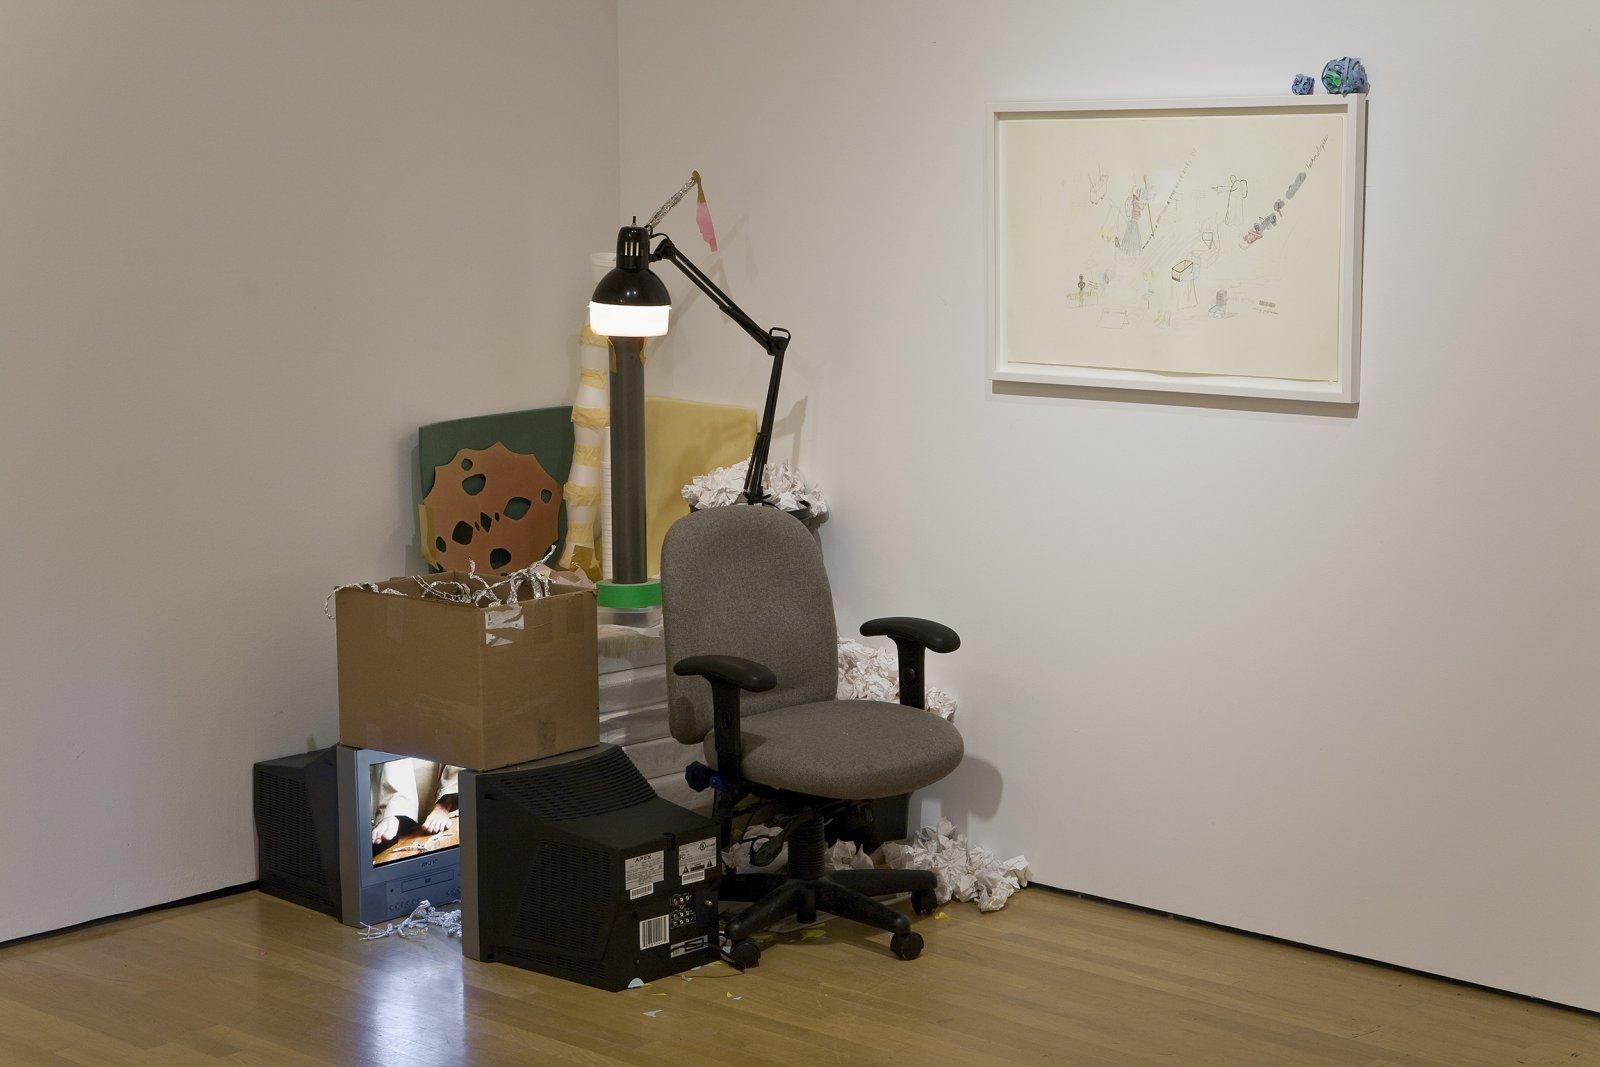 Geoffrey Farmer,Entrepreneur Alone Returning Back to Sculptural Form, 2002, mixed media, dimensions variable. Installation view, Musée d'art contemporain de Montréal, 2008